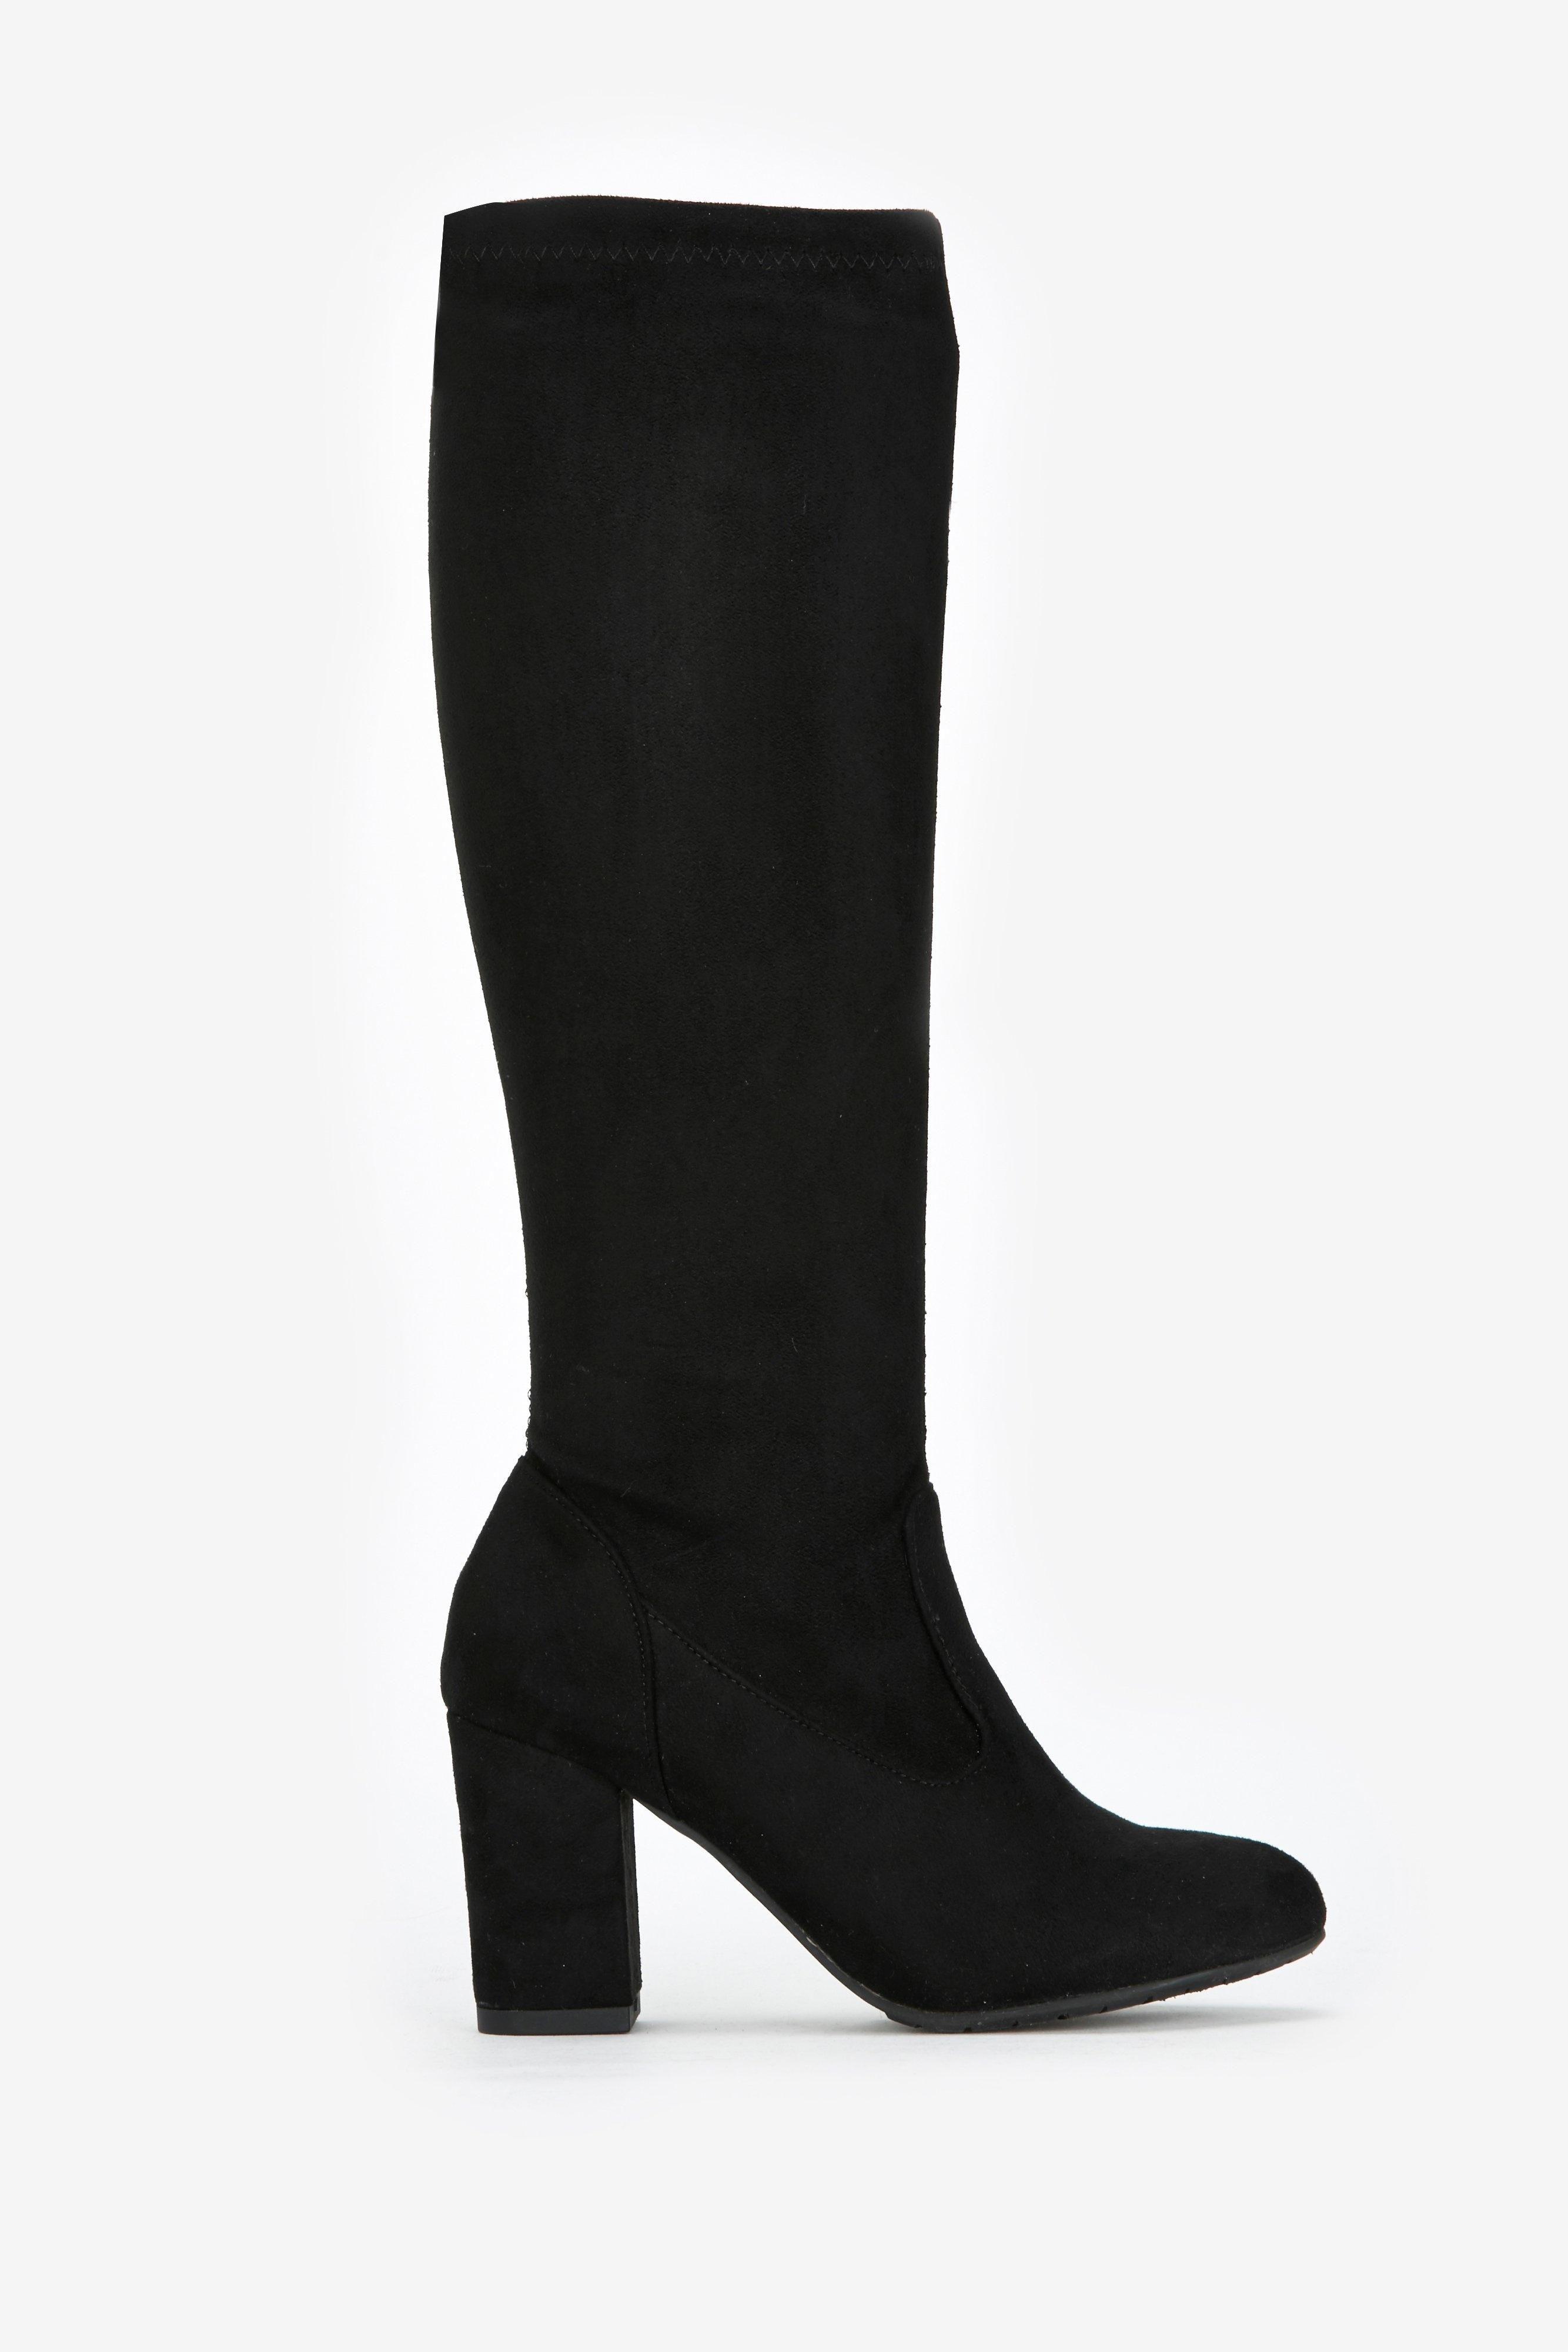 sale online large discount los angeles Women's Black Sock Fit High Leg Boot | heel boots in 2019 ...